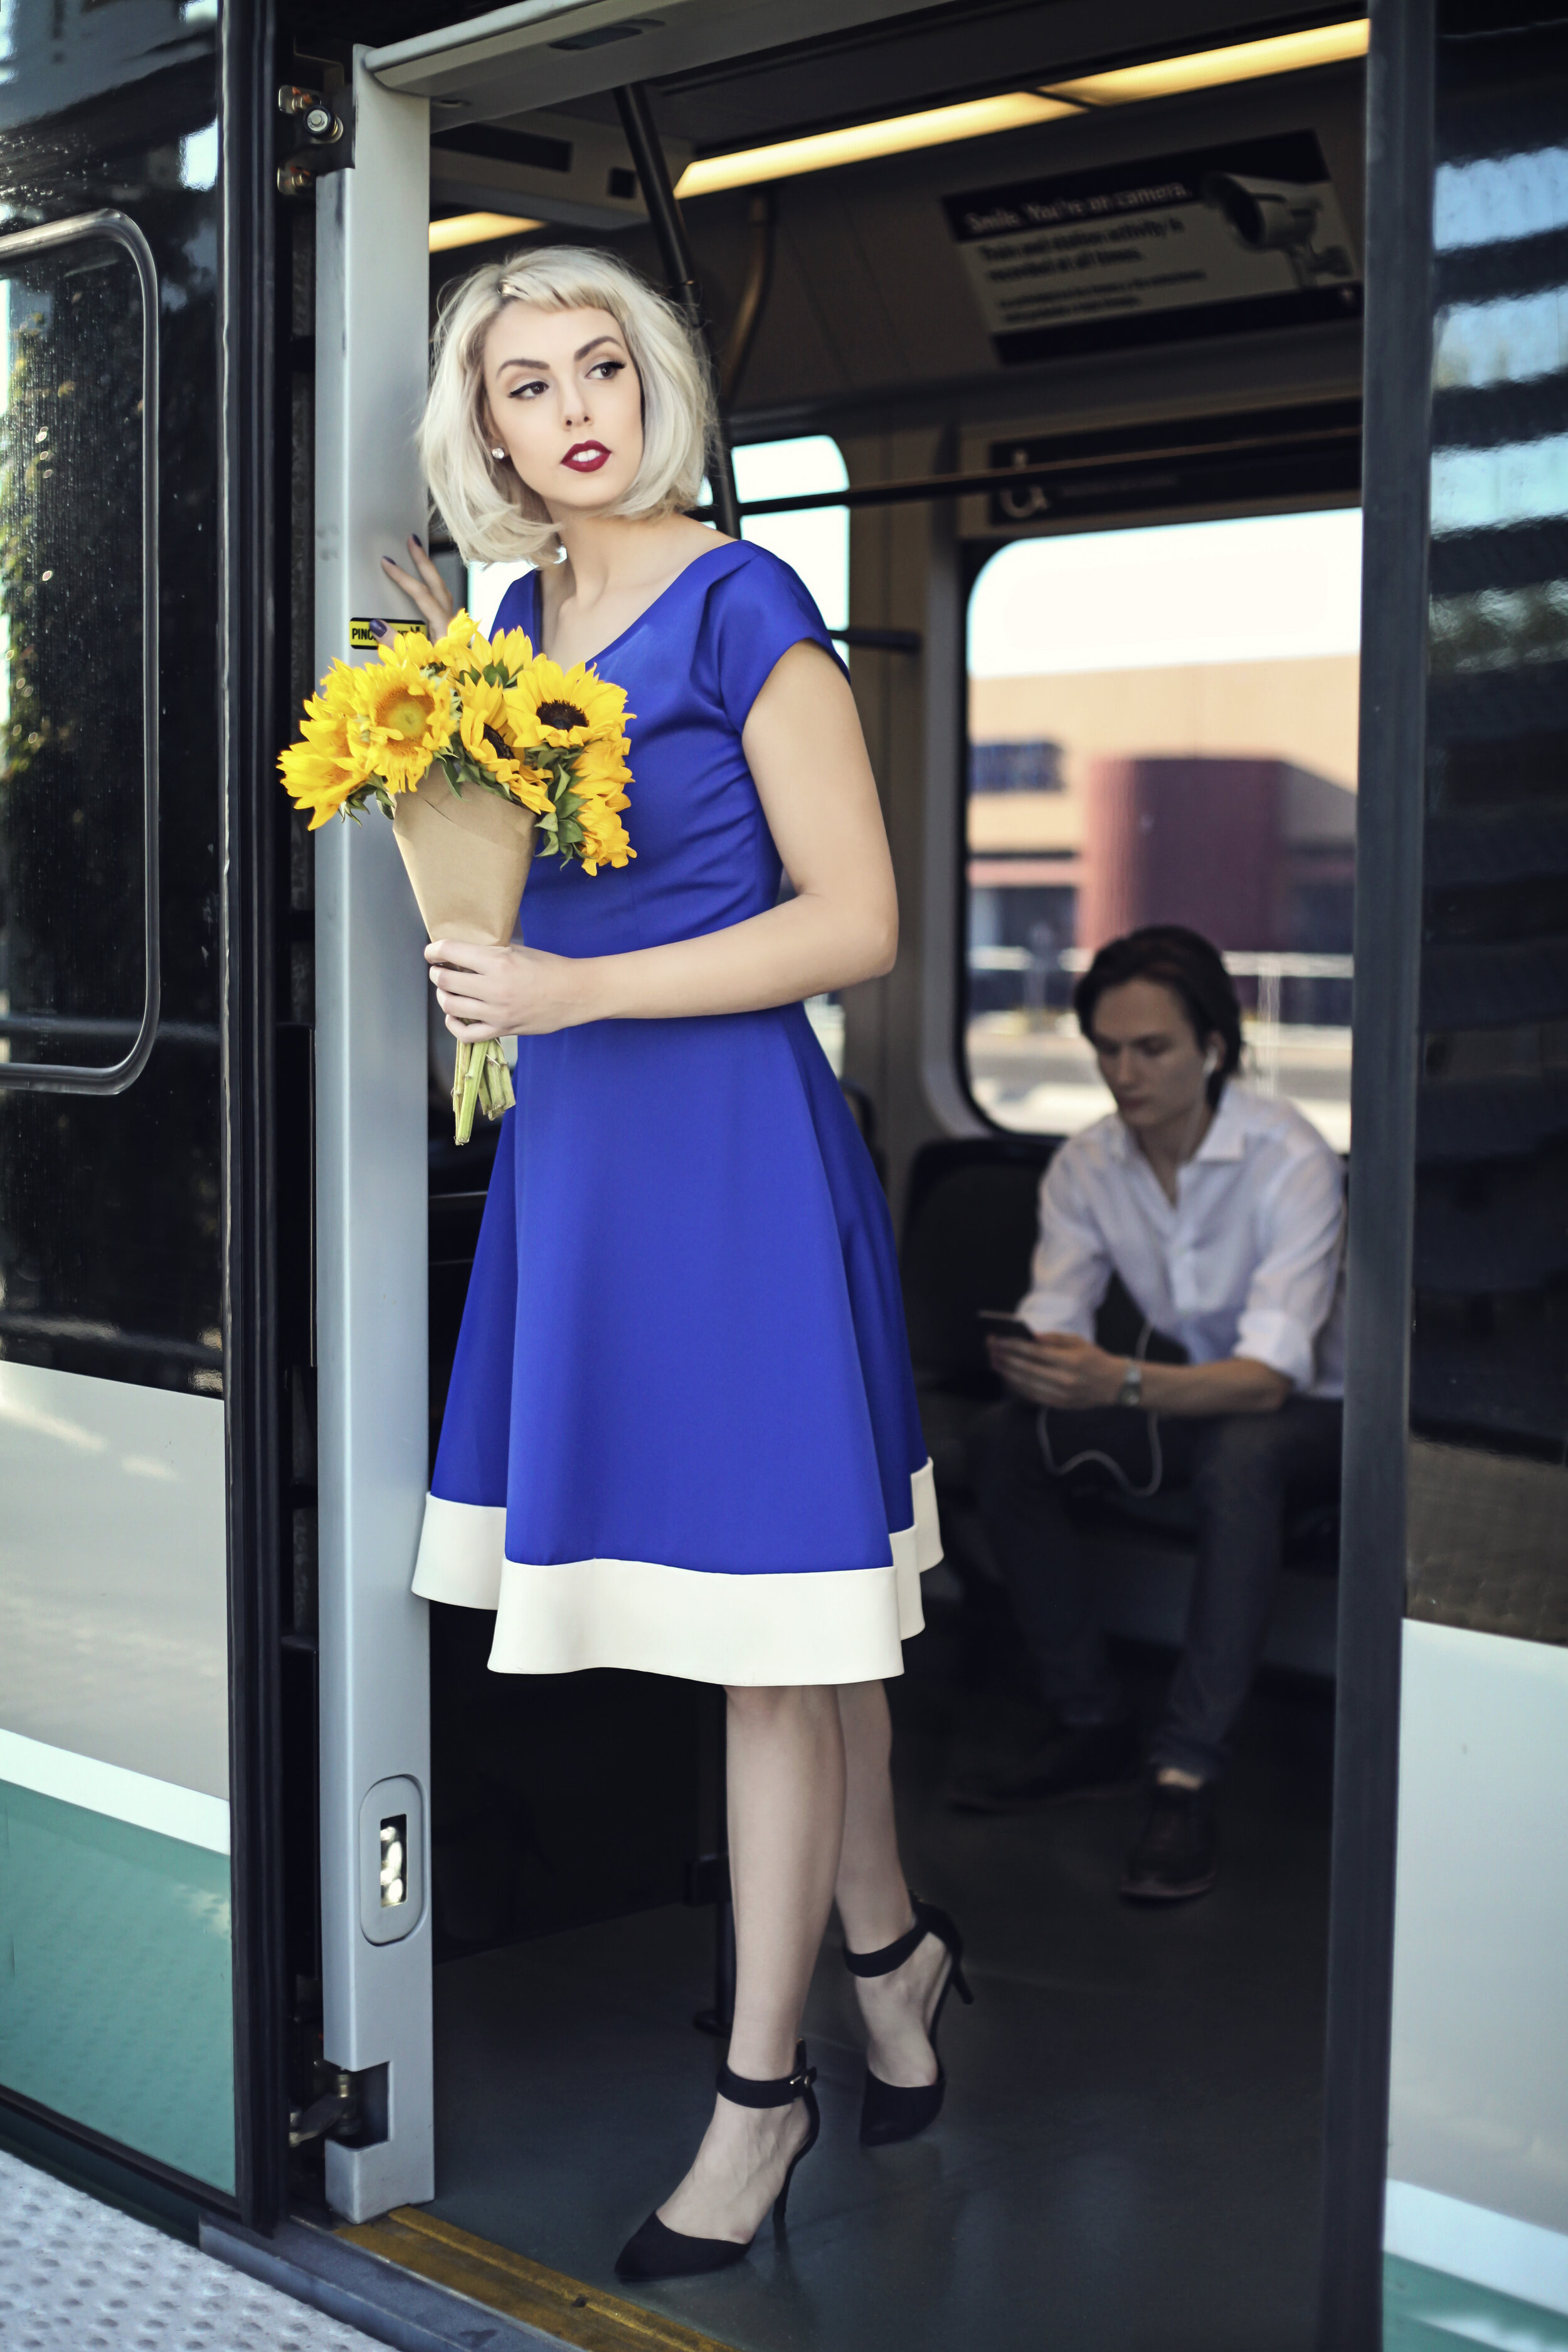 Rockabilly 50 60s swing dress custom made by Alis Fashion Design with sun flower bouquet in the train Mesa Arizona.jpg